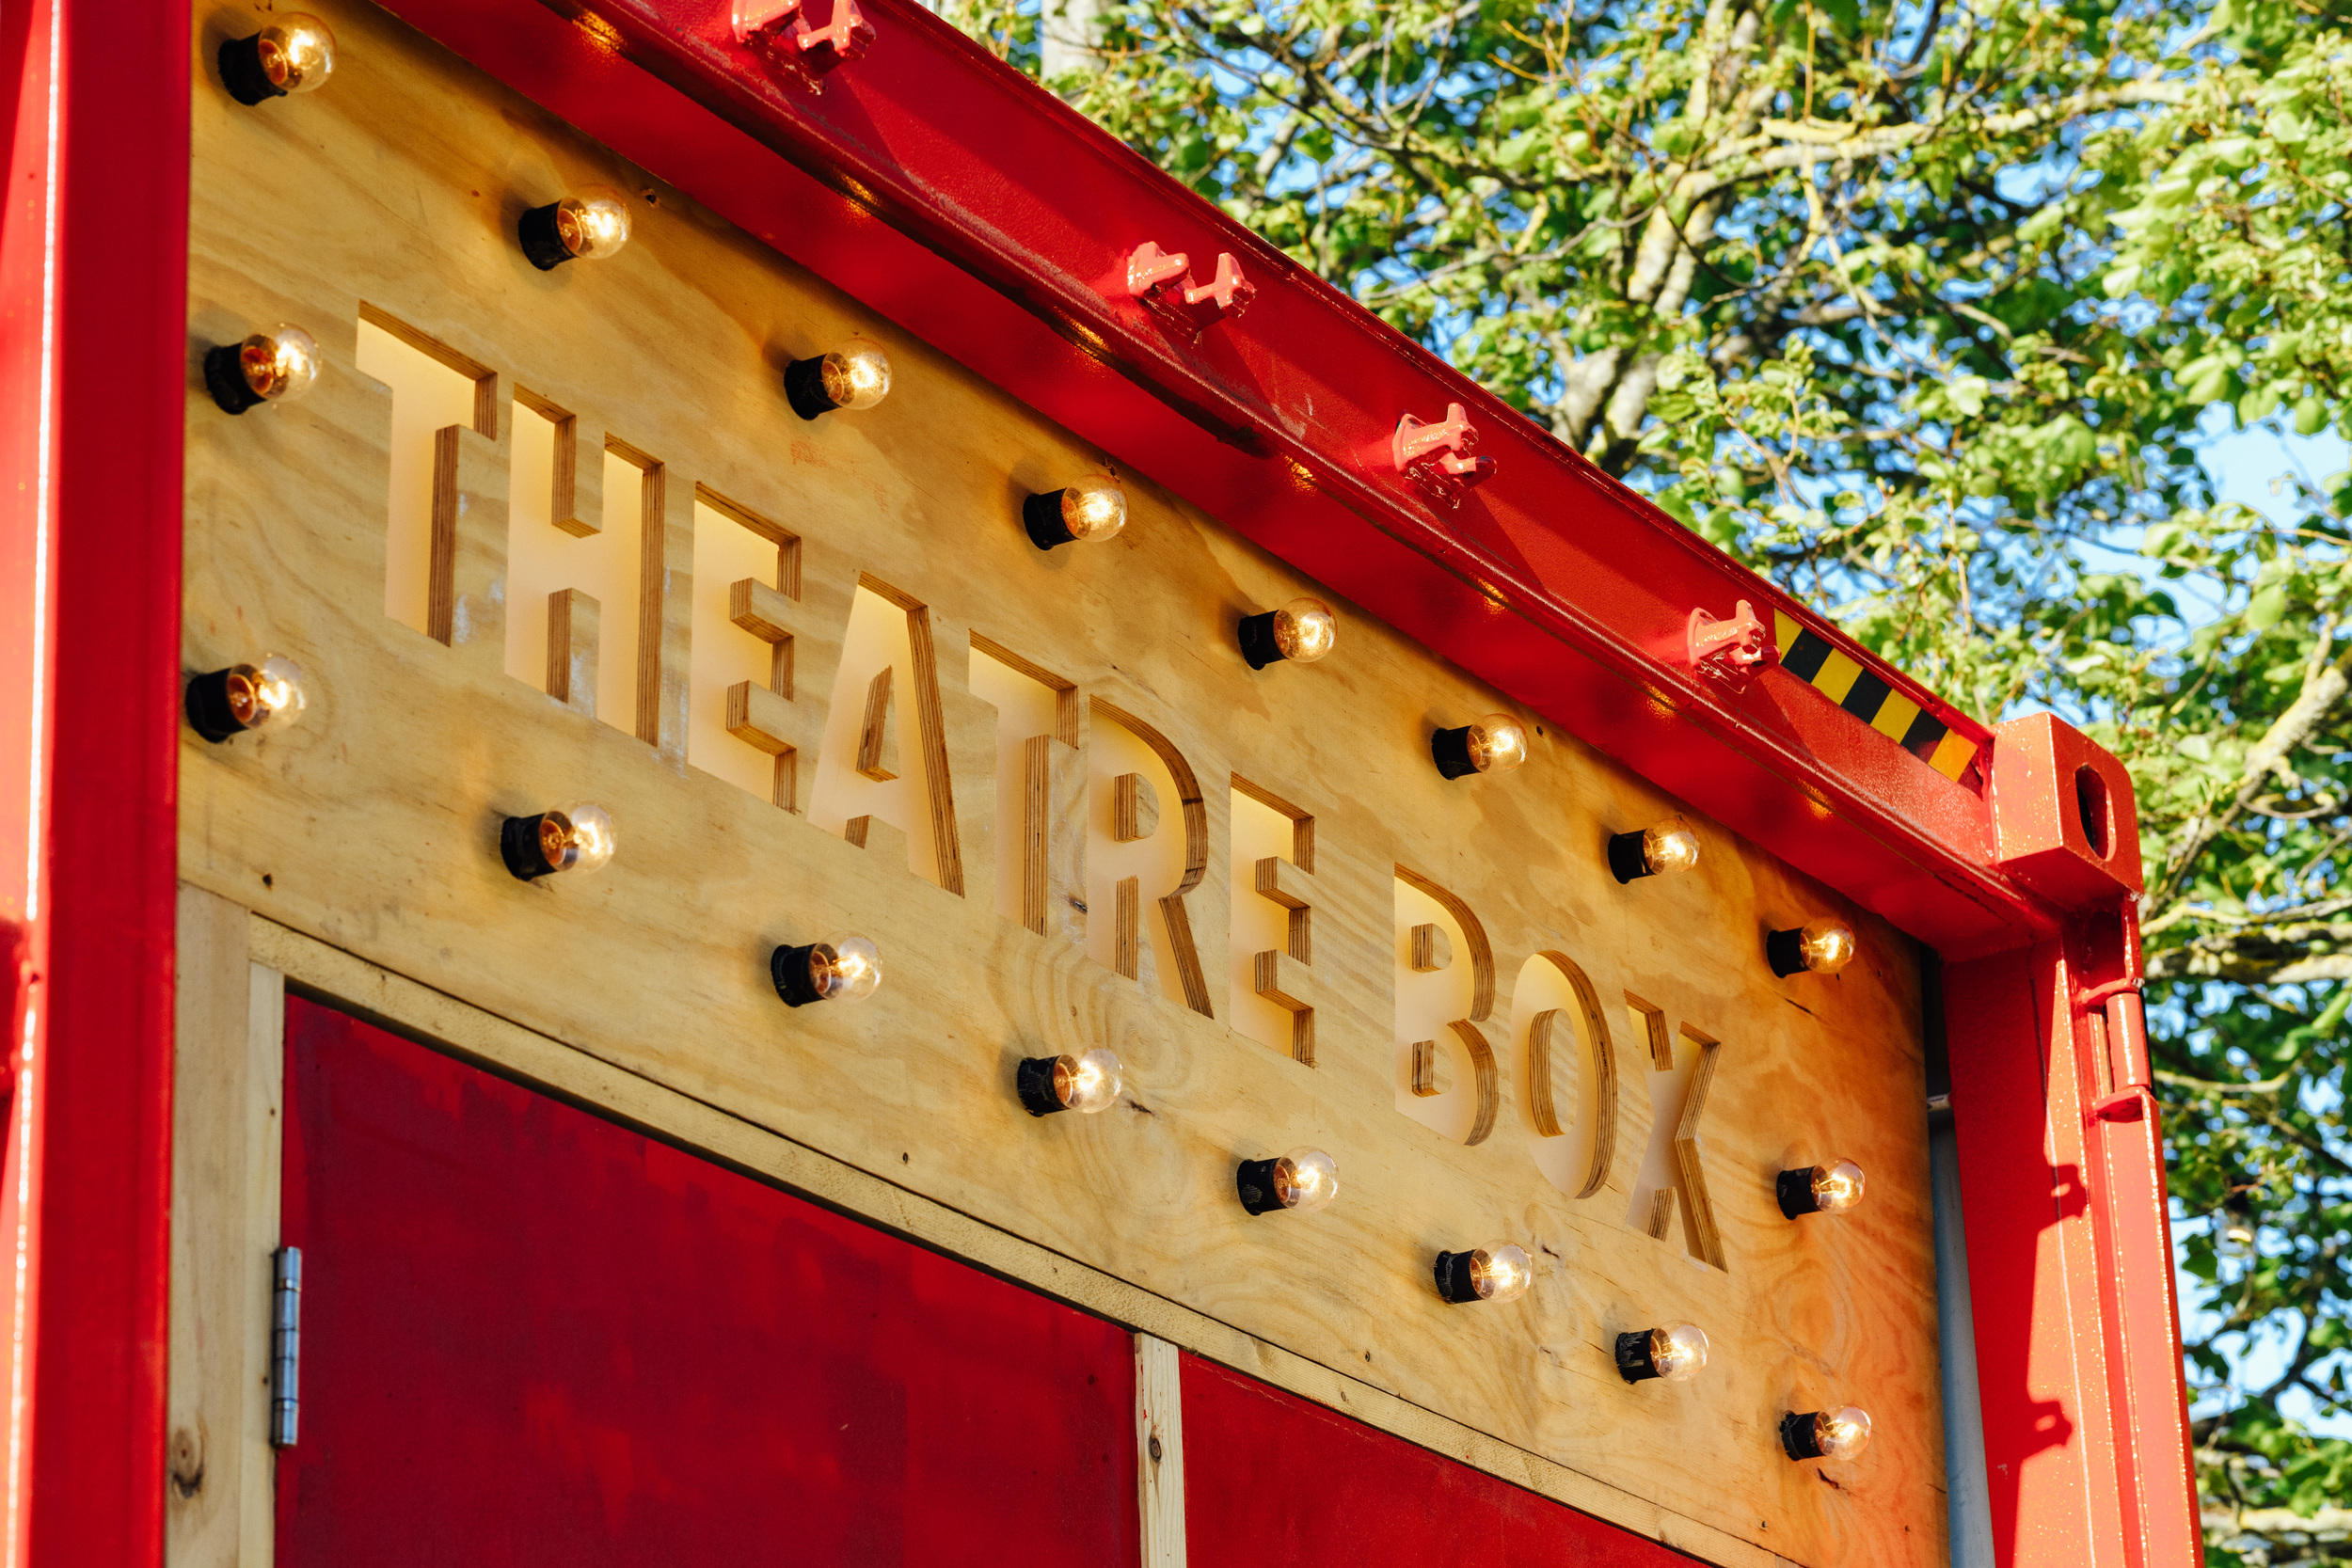 005 Theatre Box.jpg